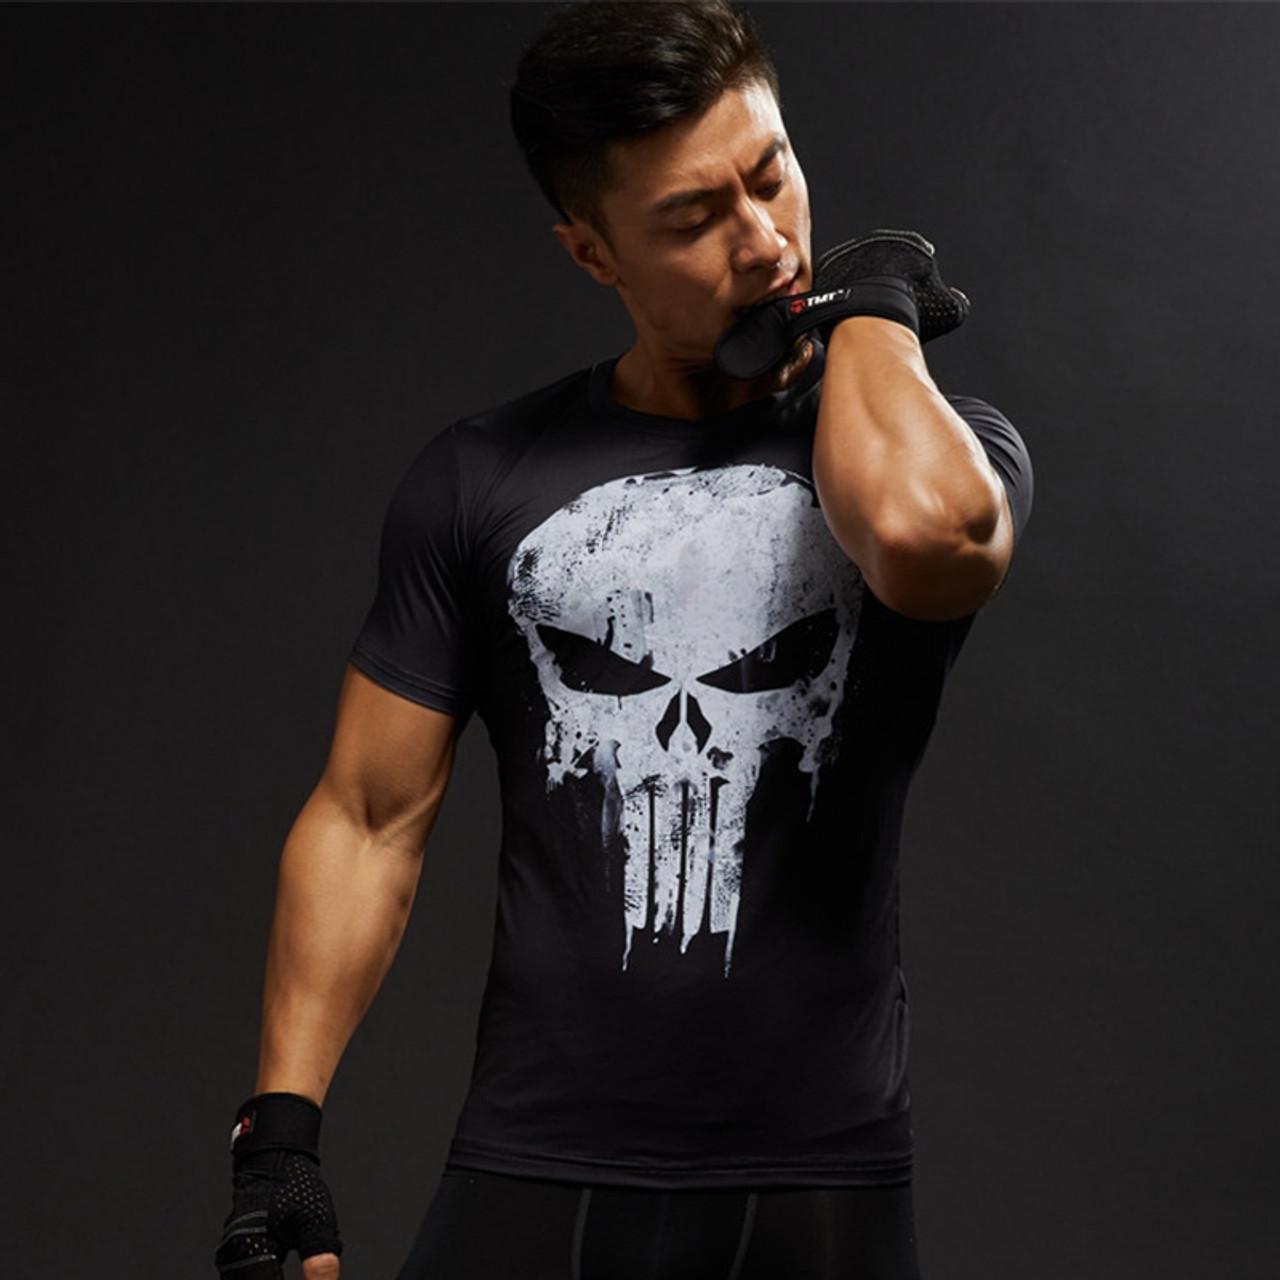 64dacead85e Captain America 3D T Shirt Men T-Shirt Male Crossfit Tops Print Anime  Superhero Superman tshirt Men Fitness Compression Shirts